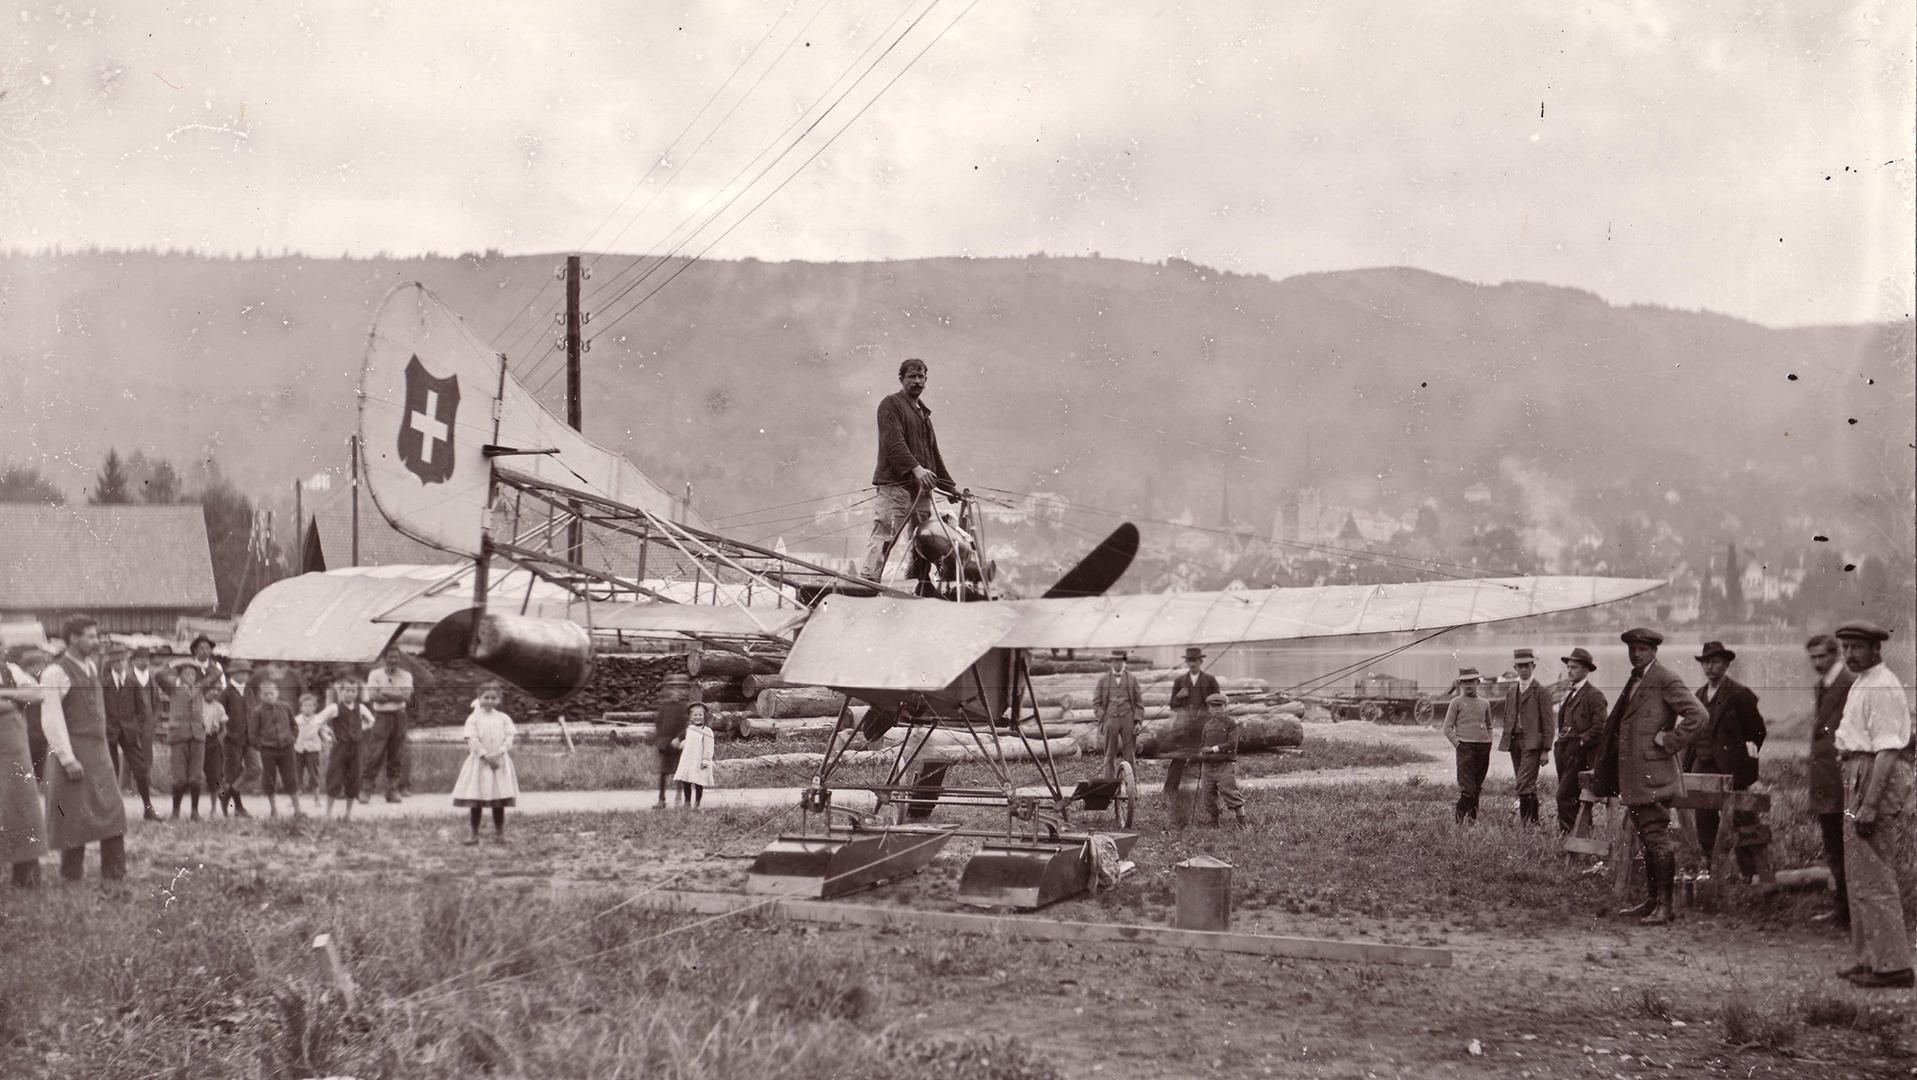 Seaplane on the Schützenmatt in Zug.